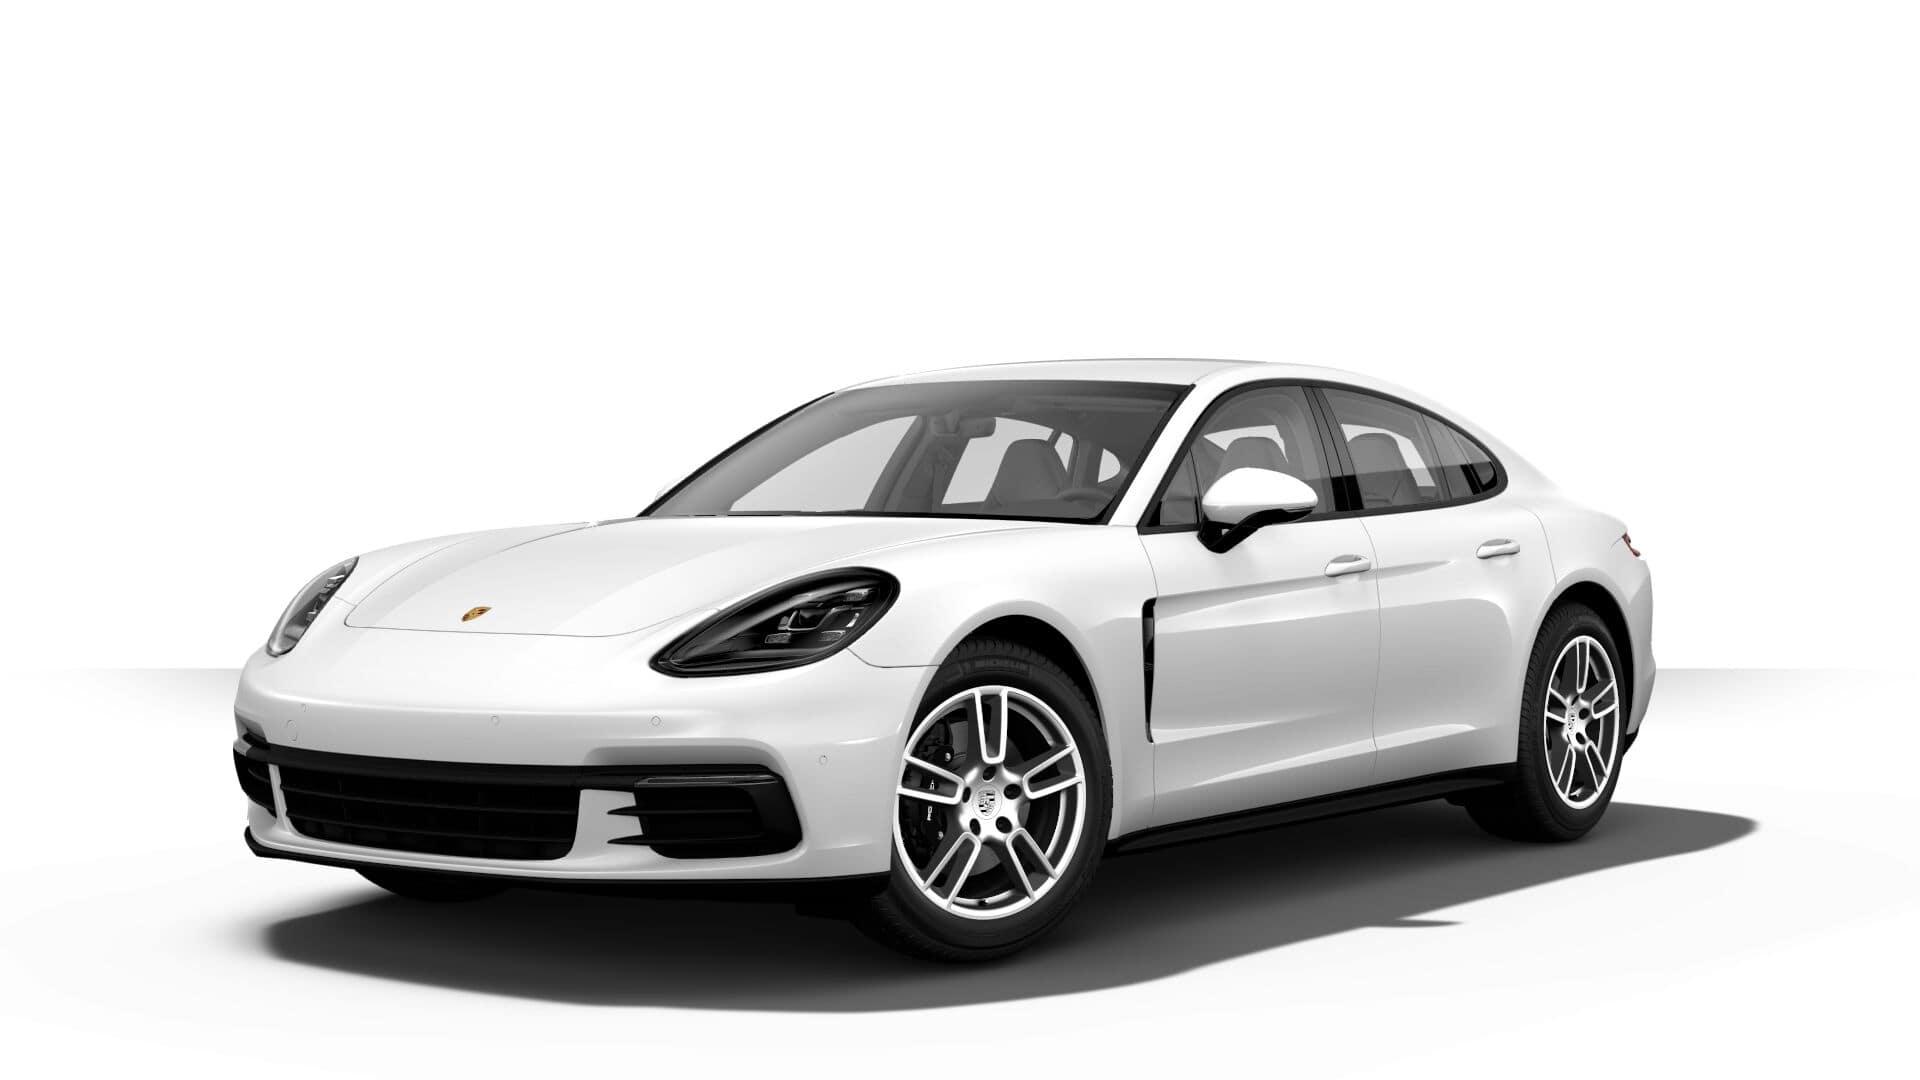 New 2021 Porsche Panamera | Porsche Minneapolis